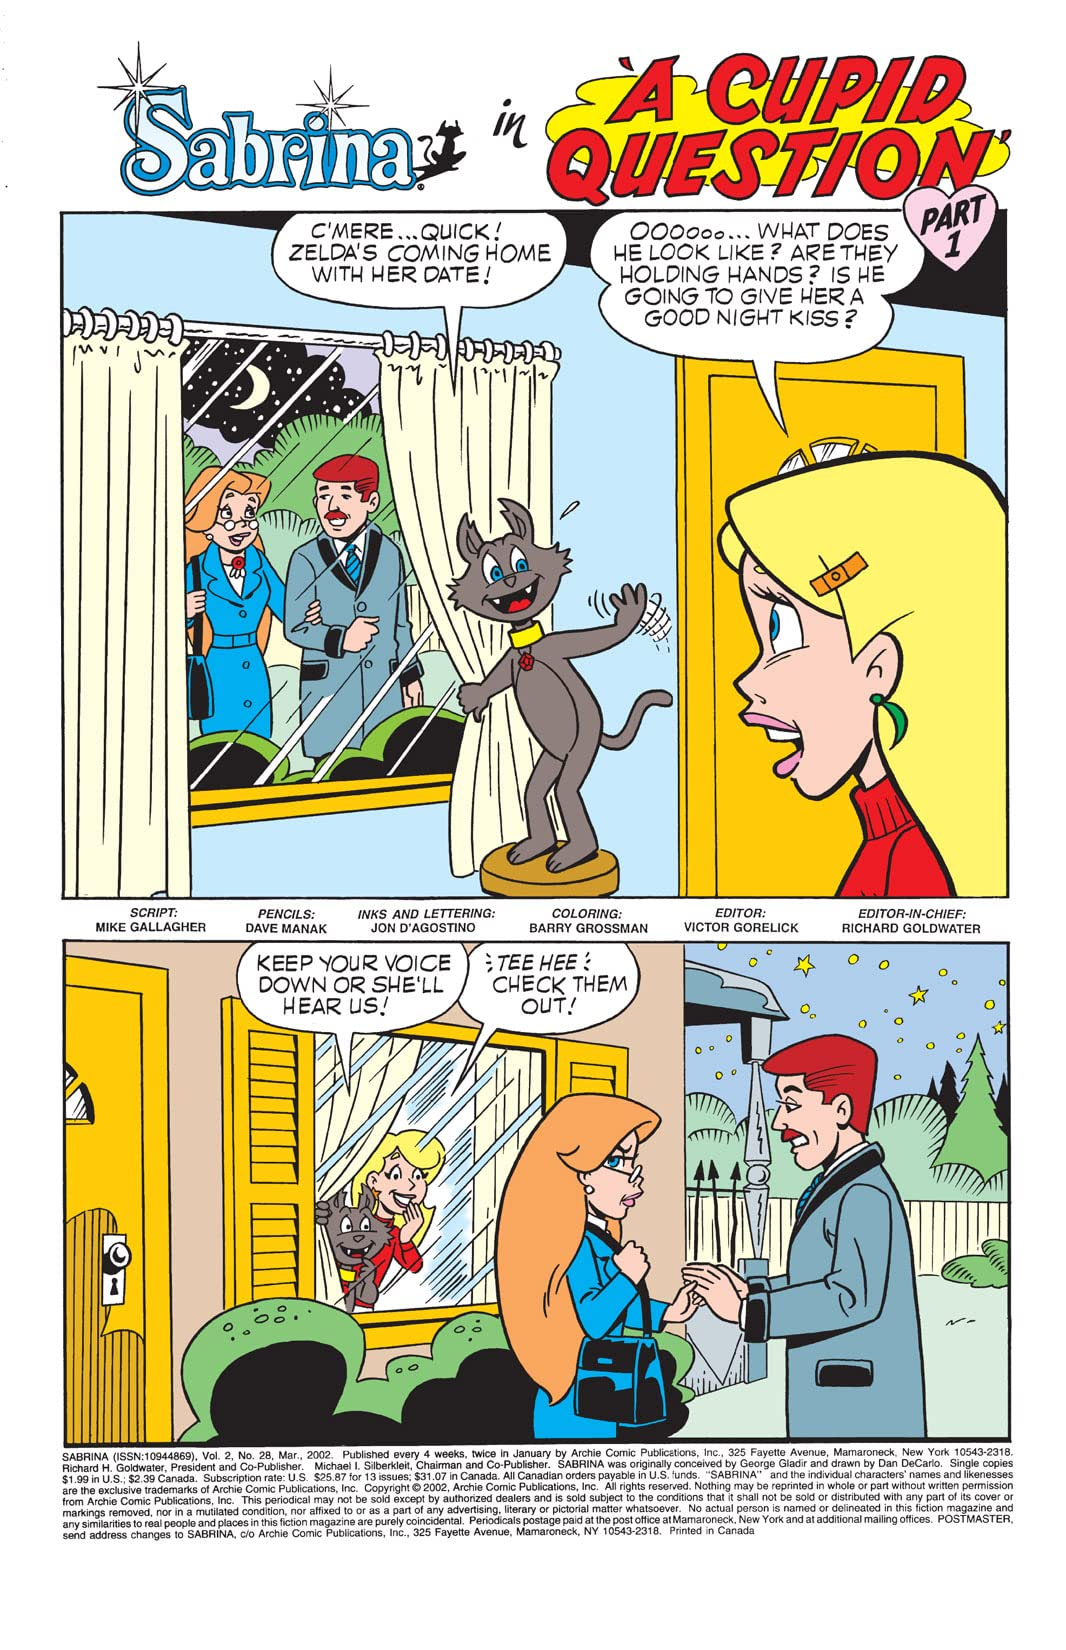 Sabrina the Teenage Witch Animated Series #28